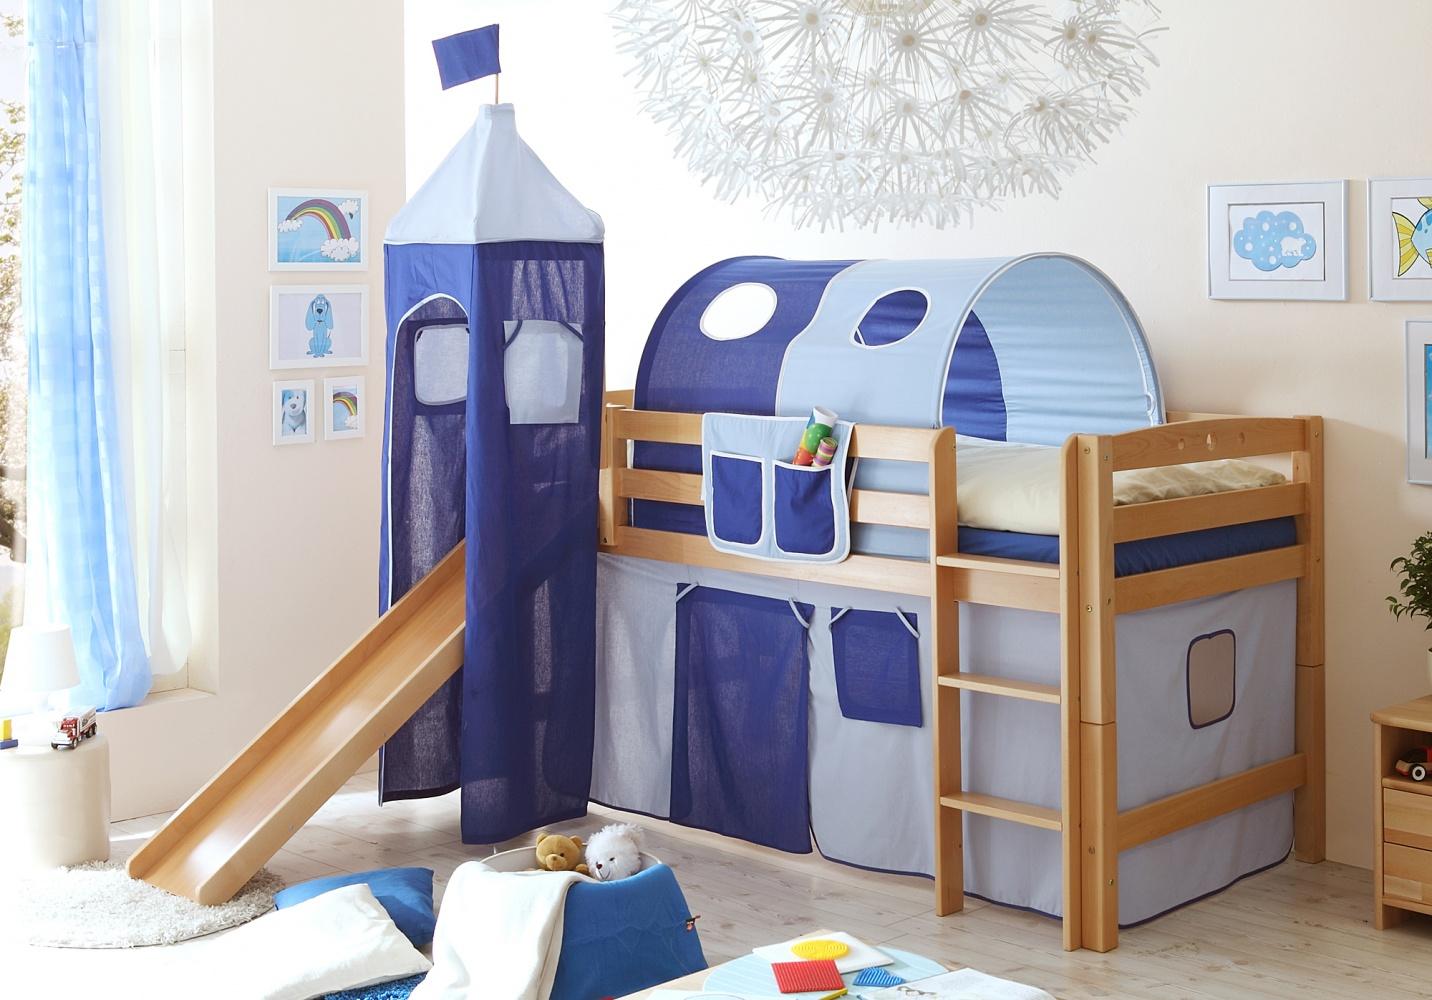 Ticaa Rutschbett mit Turm Toby R Buche Natur - hellblau-dunkelblau Bild 1